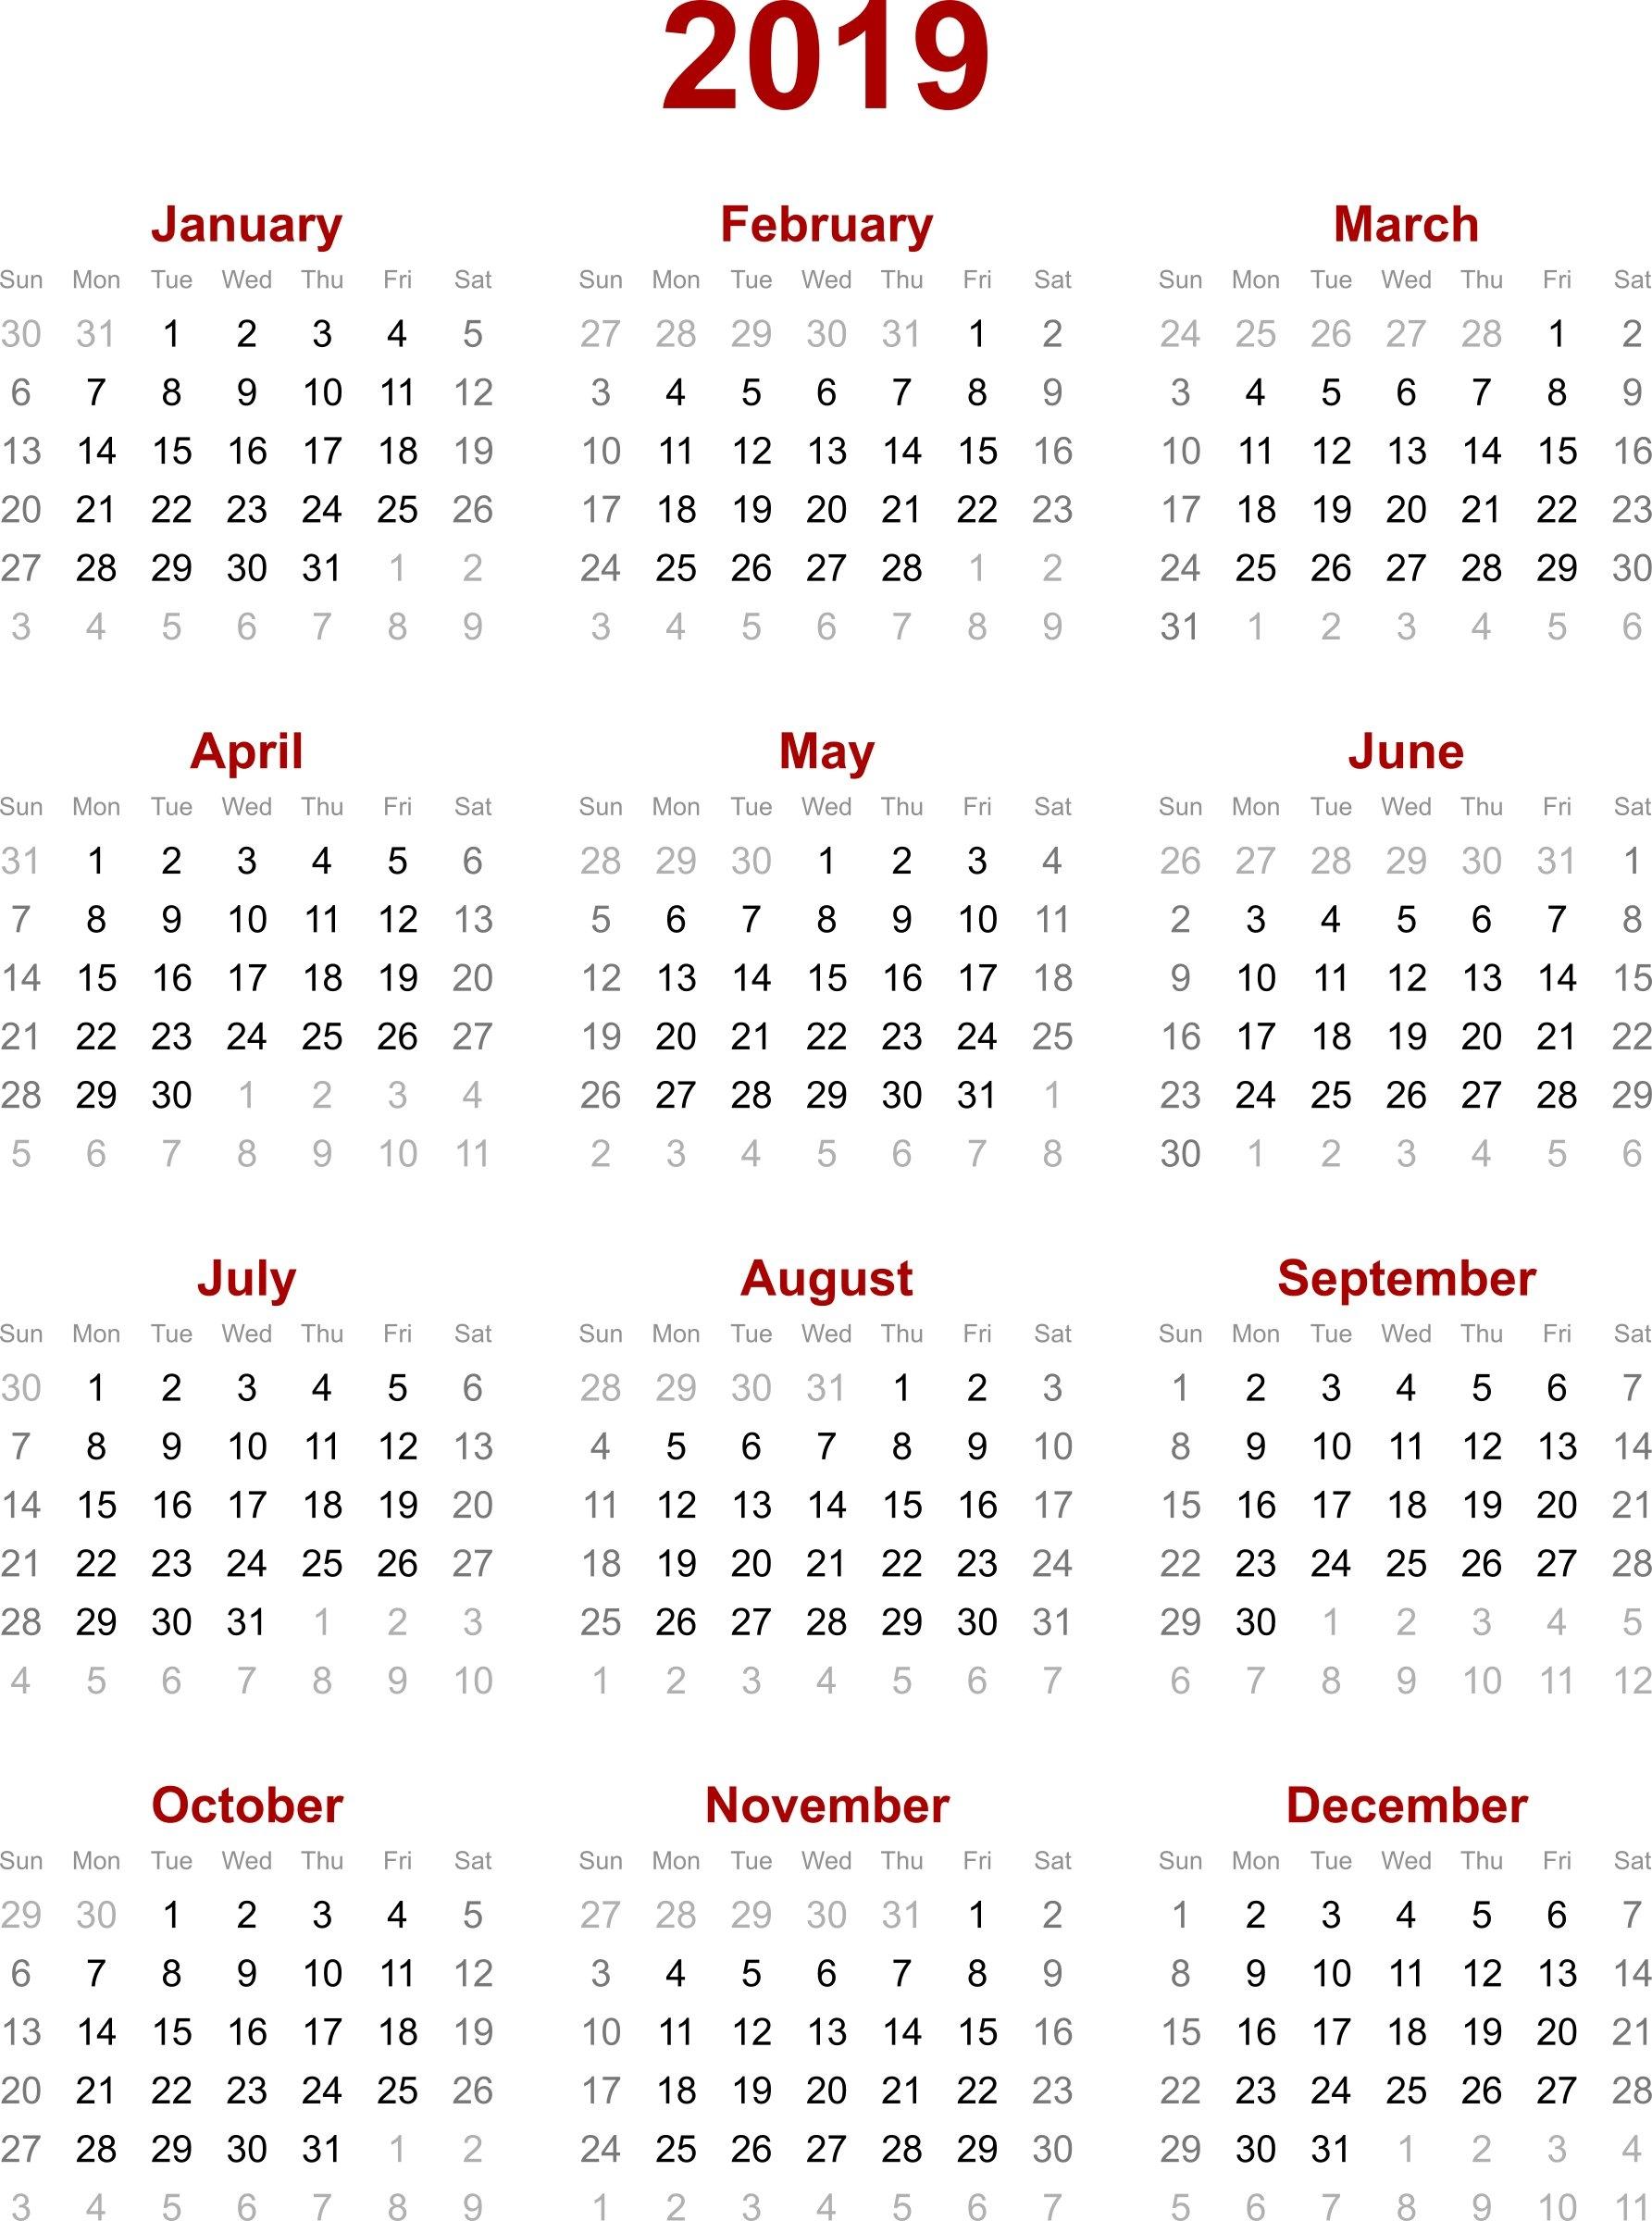 2019 Calendar Printable - Printable Calendar & Birthday Cards 8 X 10 2019 Calendar